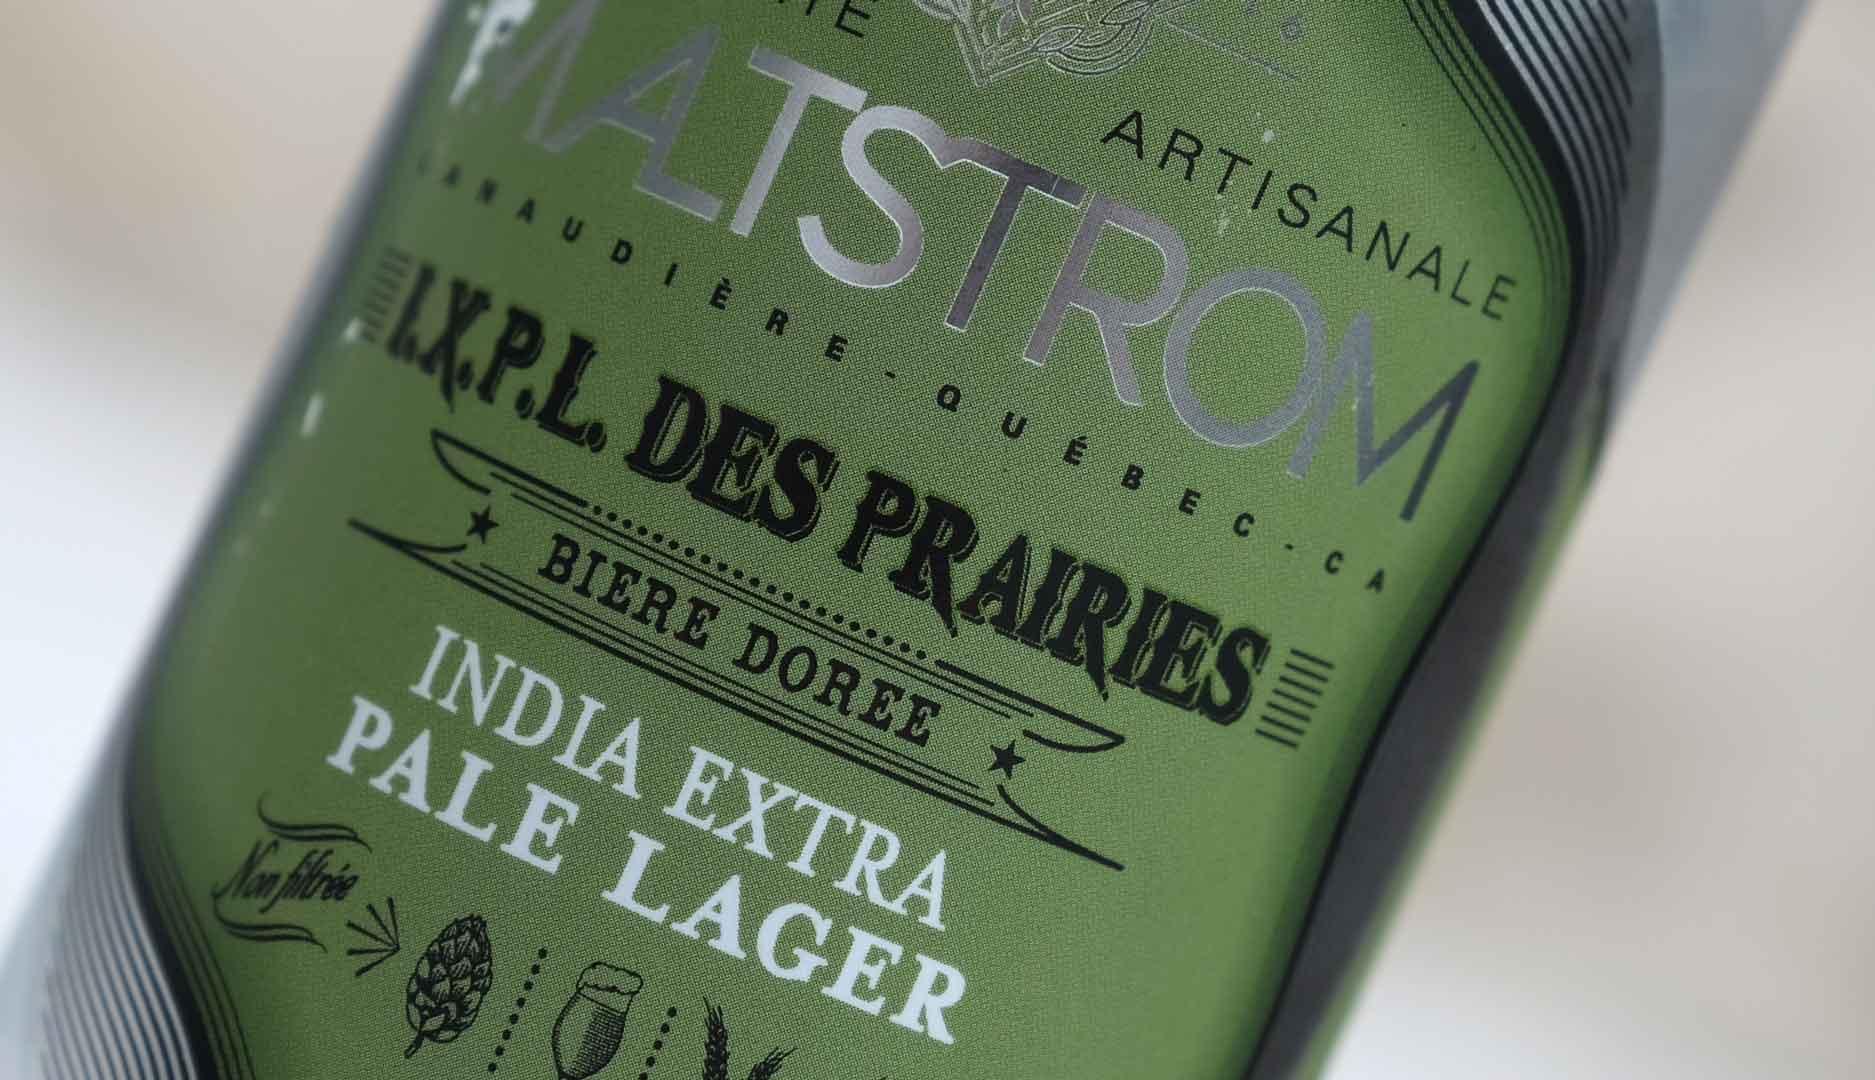 IPA-IXPL-biere-maltstrom-quebec-canada